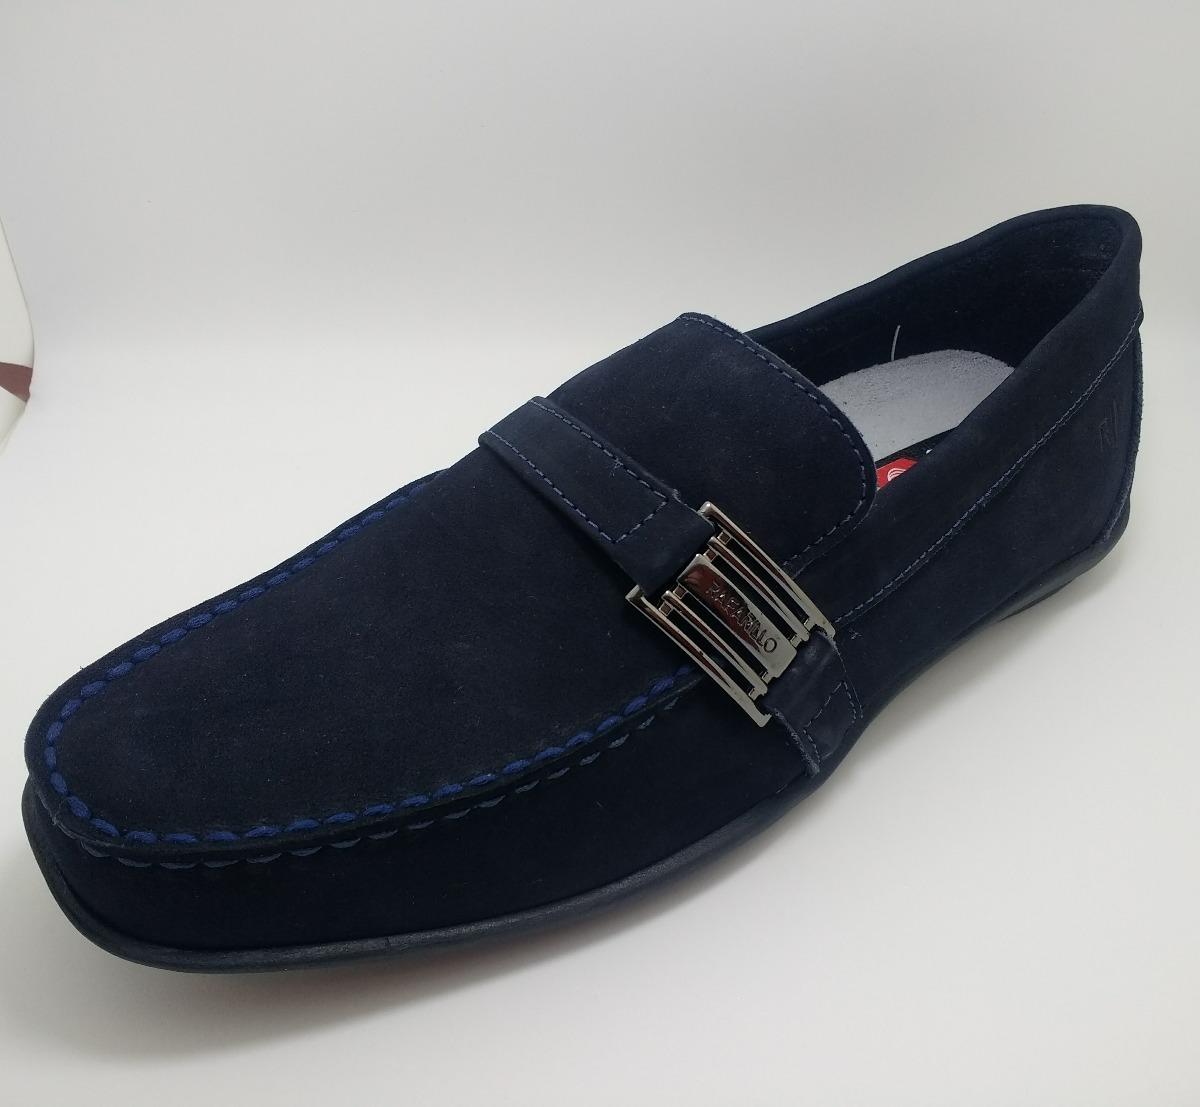 78039fc567 sapato mocassim masculino rafarillo em couro marinho. Carregando zoom.